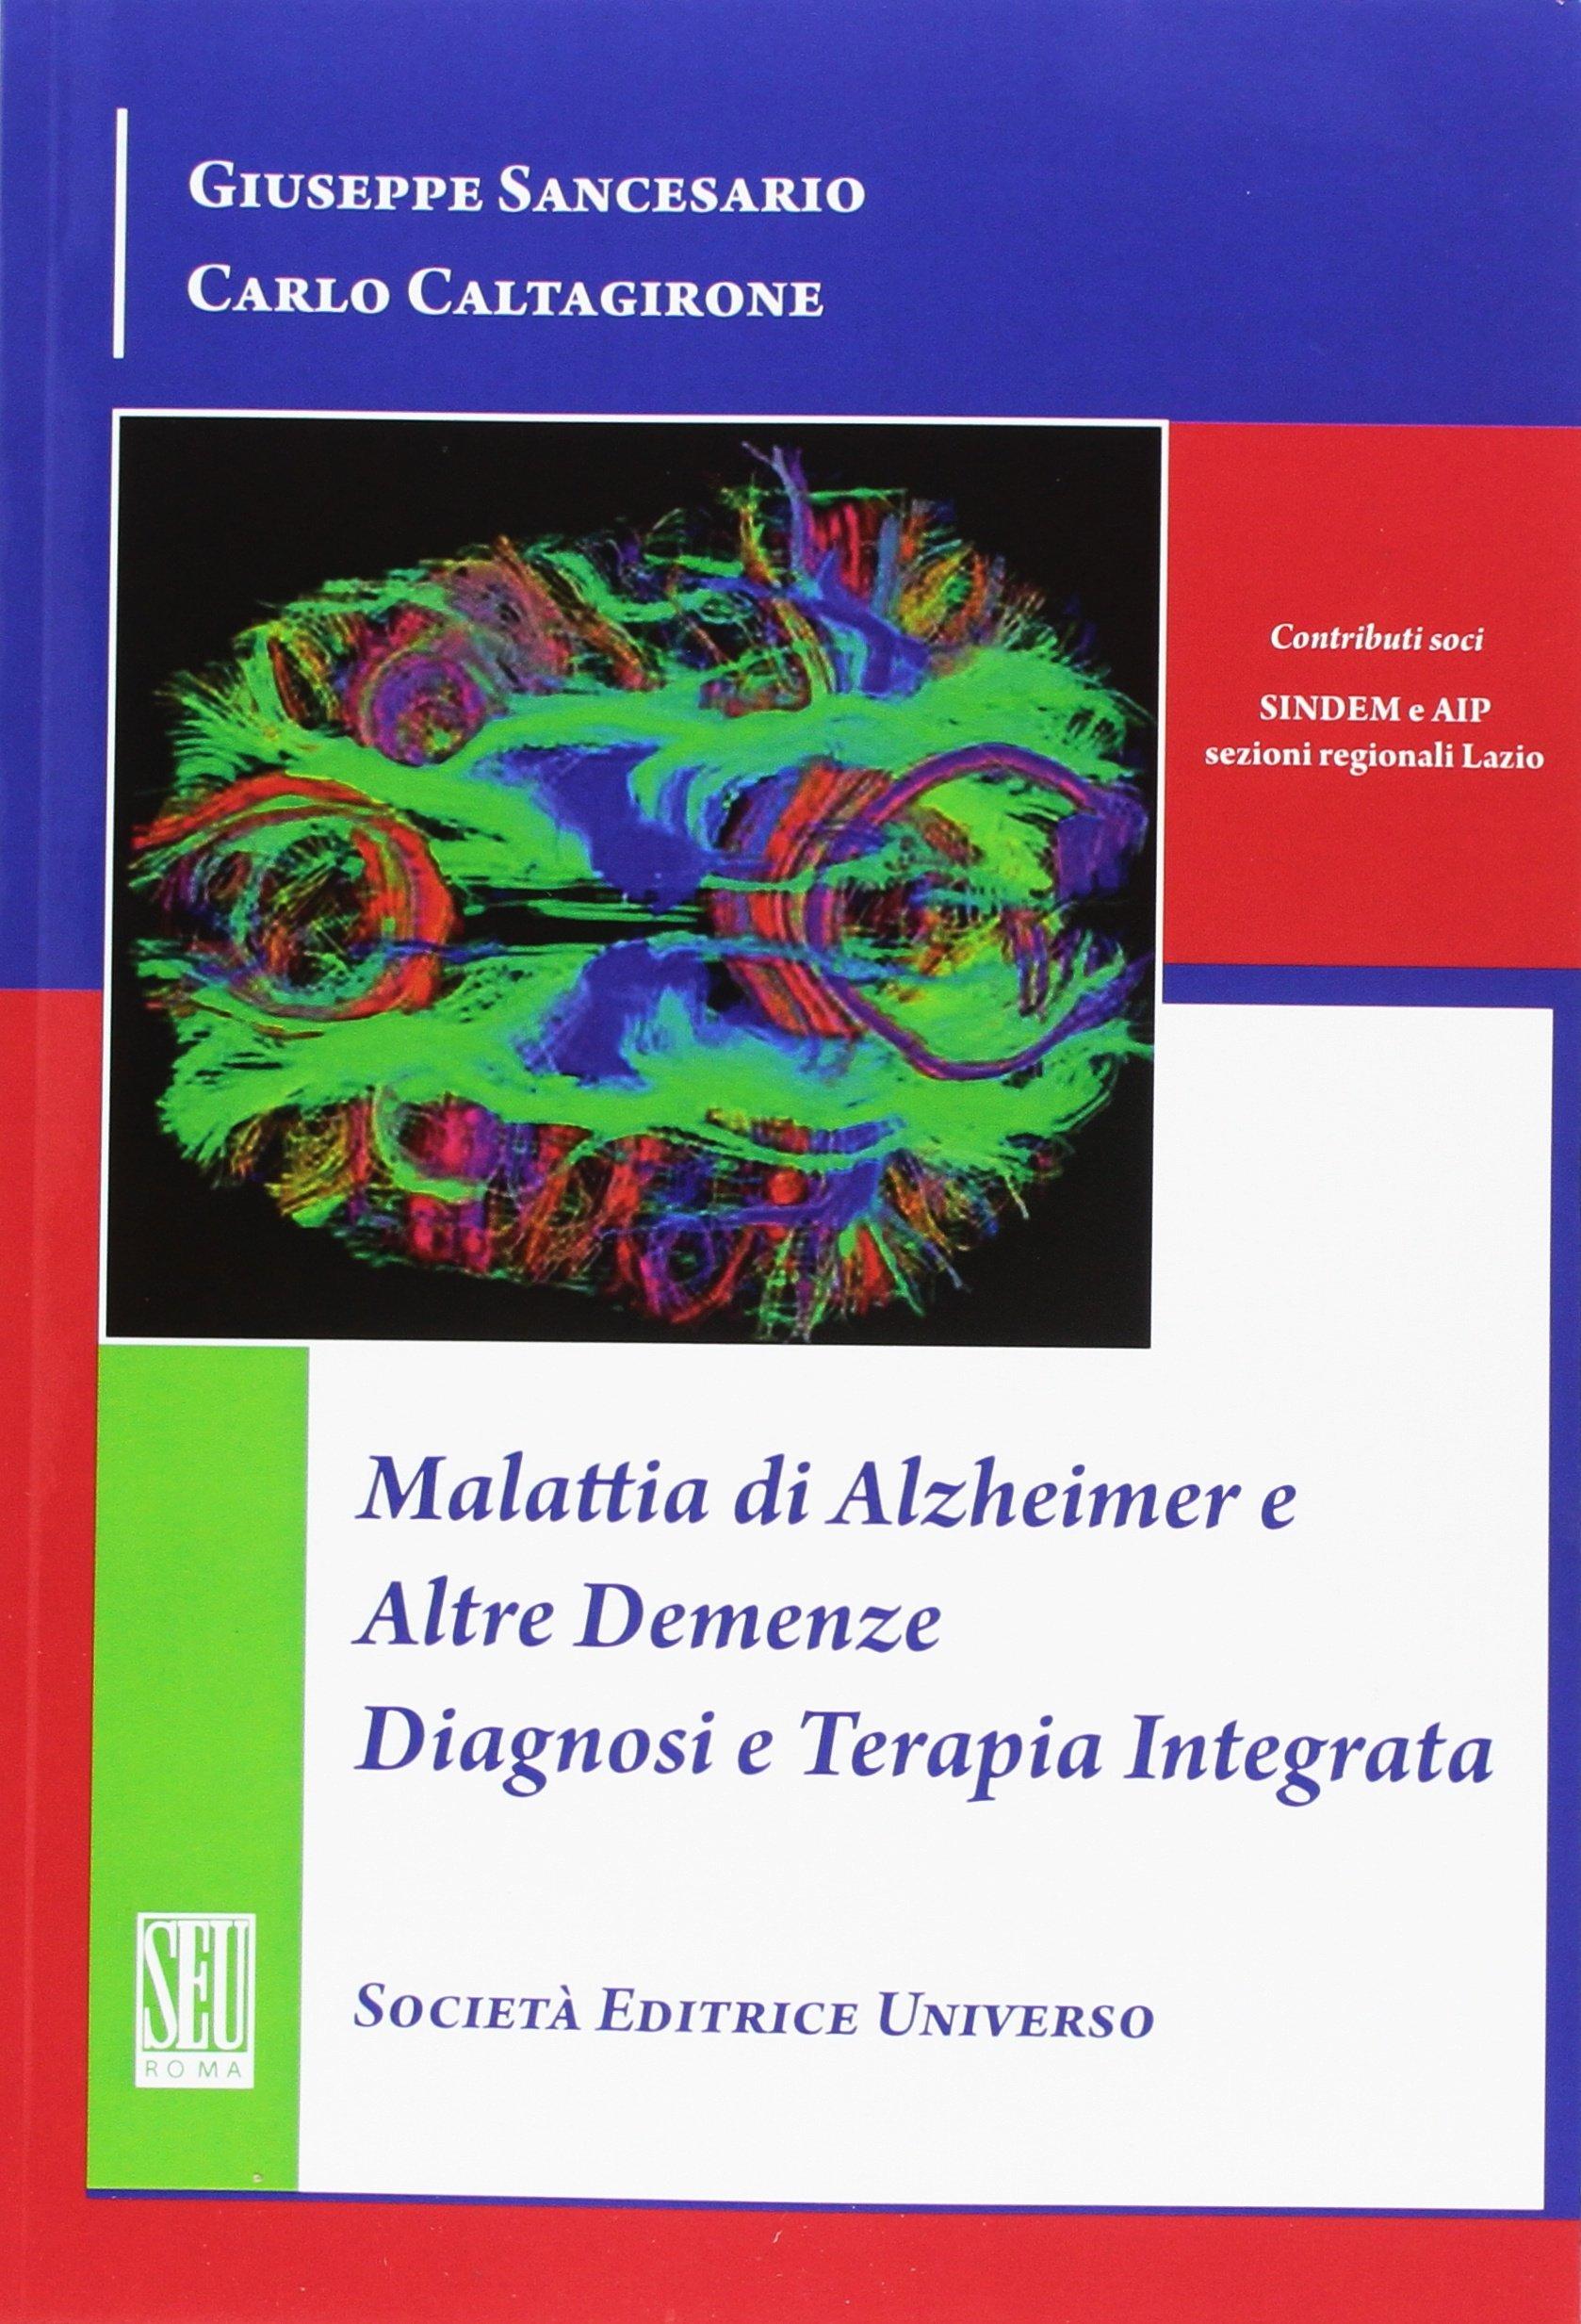 malattia di alzheimer manuale per gli operatori